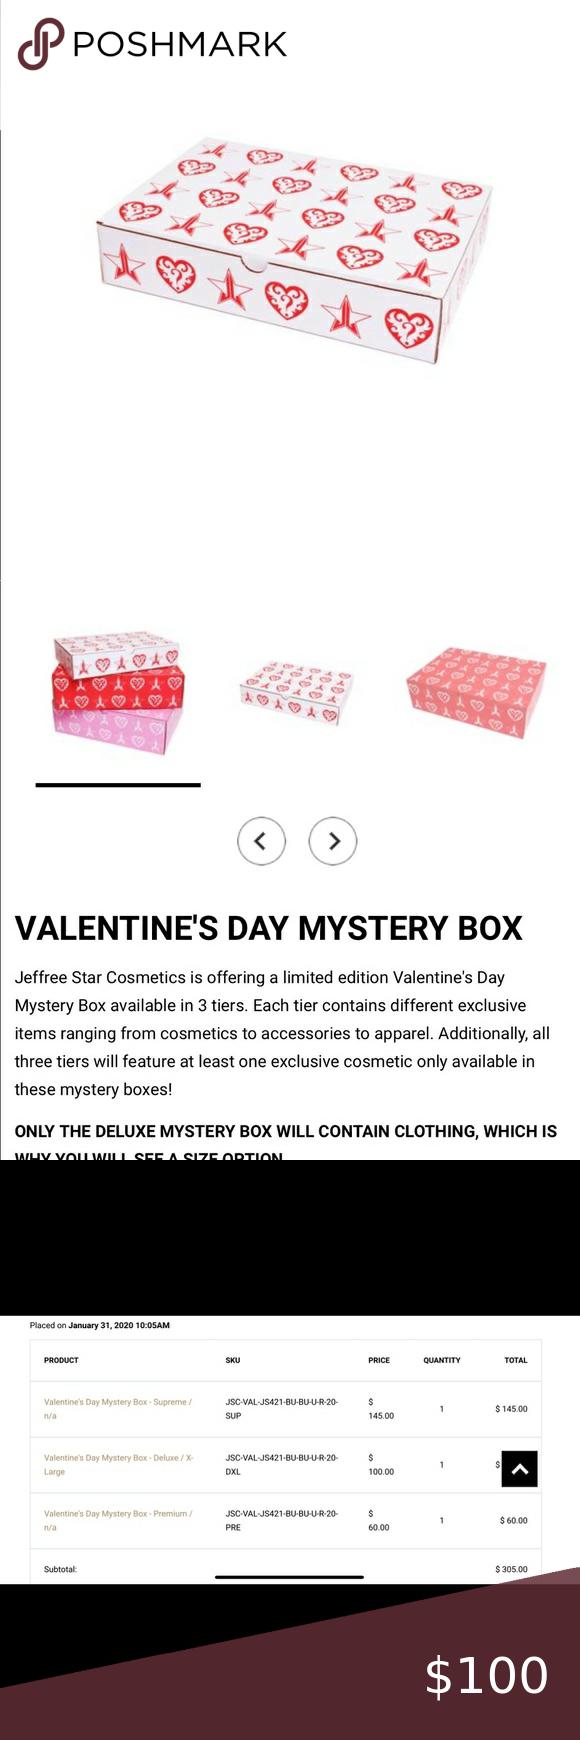 Jeffree Star 2020 Valentines Mystery Box Premium in 2020